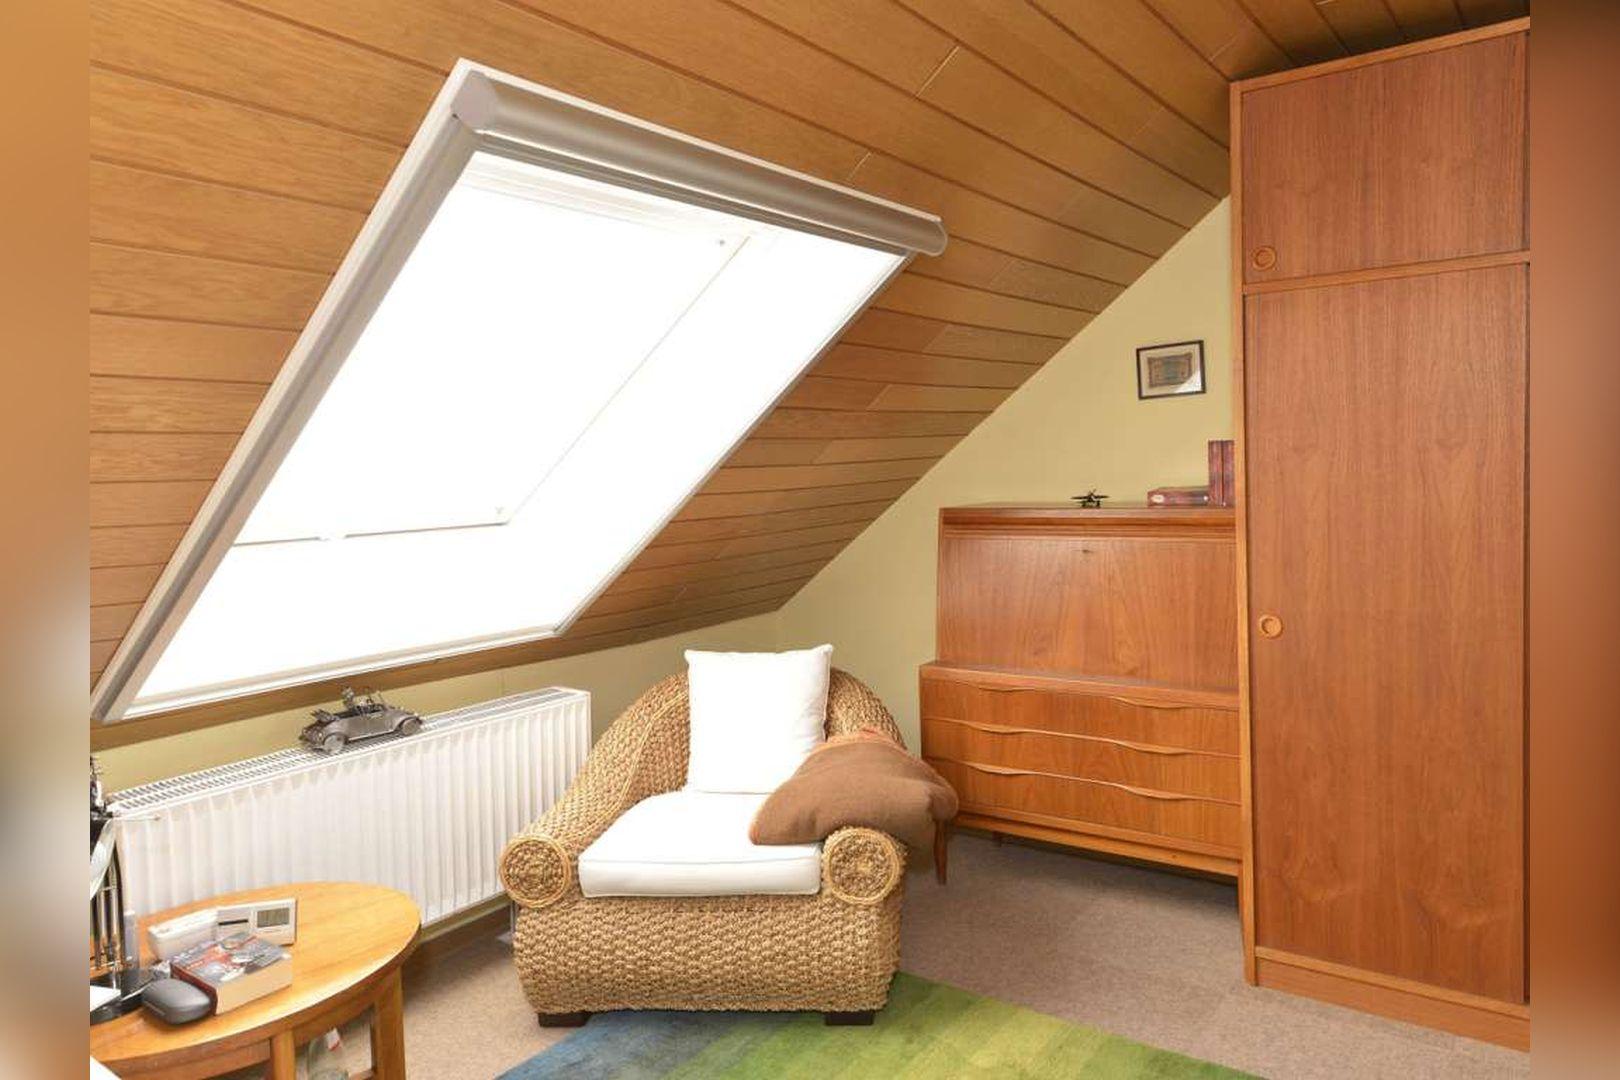 Immobilie Nr.0254 - Doppelhaushälfte rechtsbündig mit Garage & Carport  - Bild 14.jpg